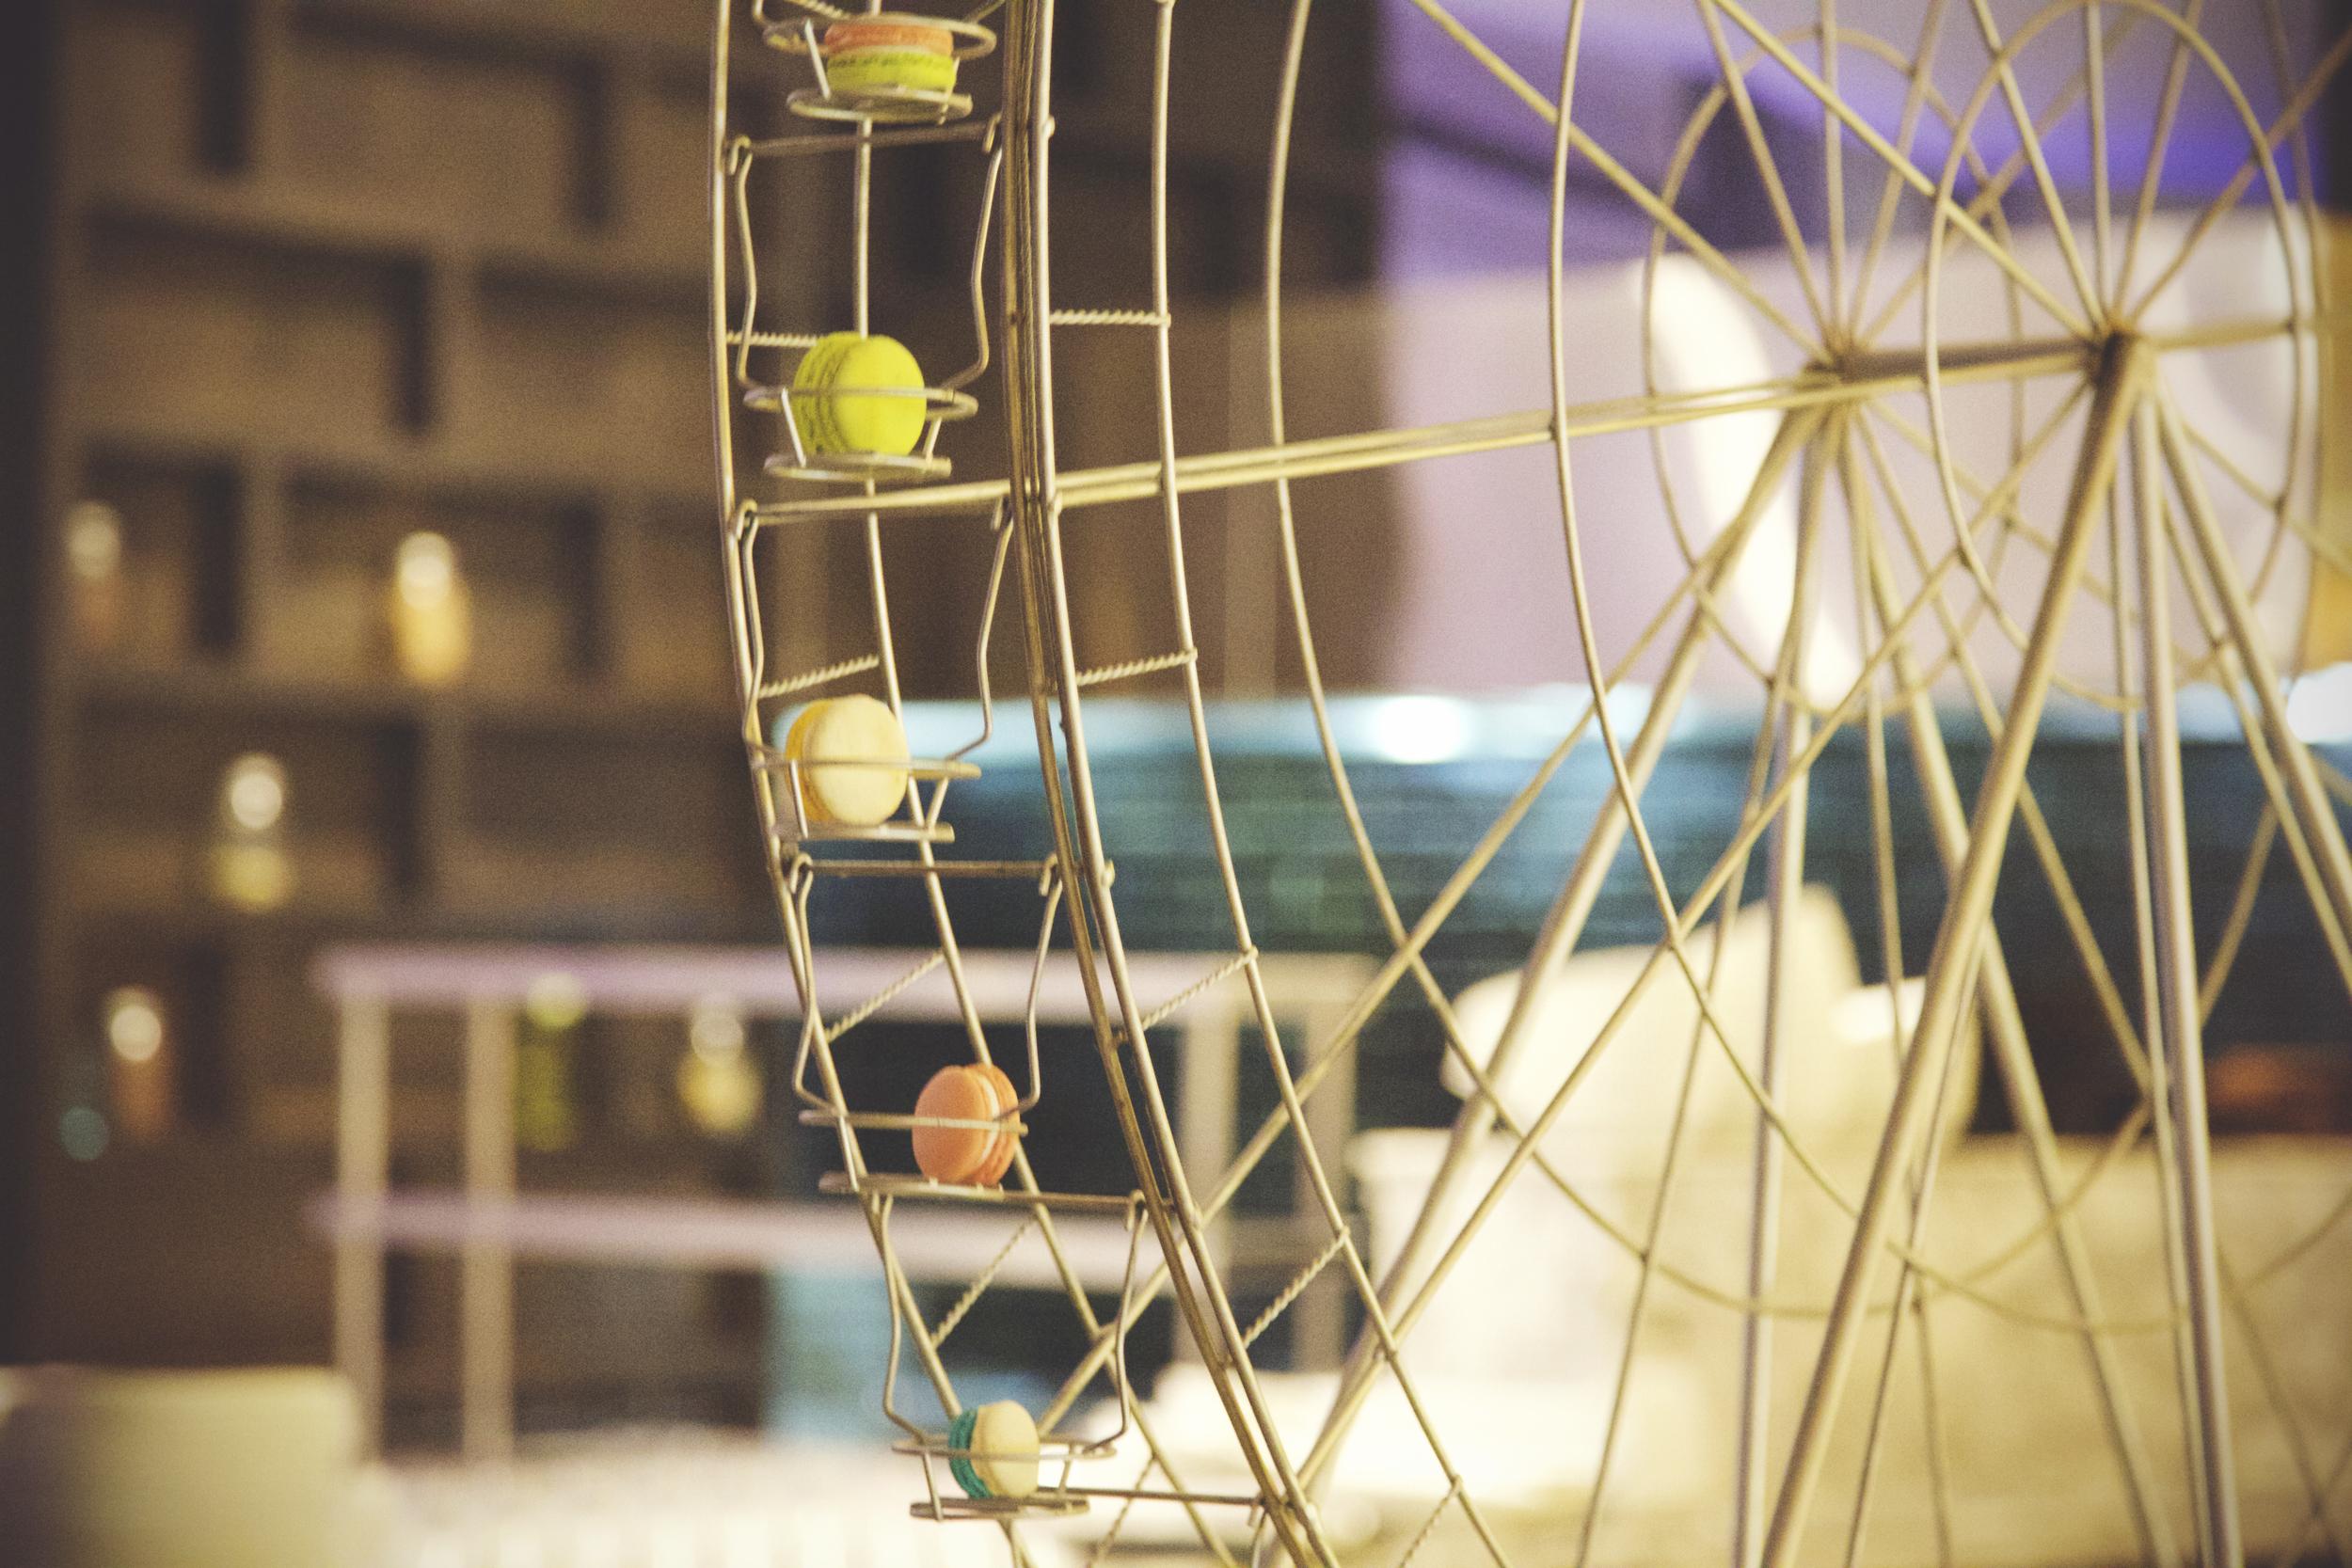 A macaron ferris wheel?! Dreams do come true!